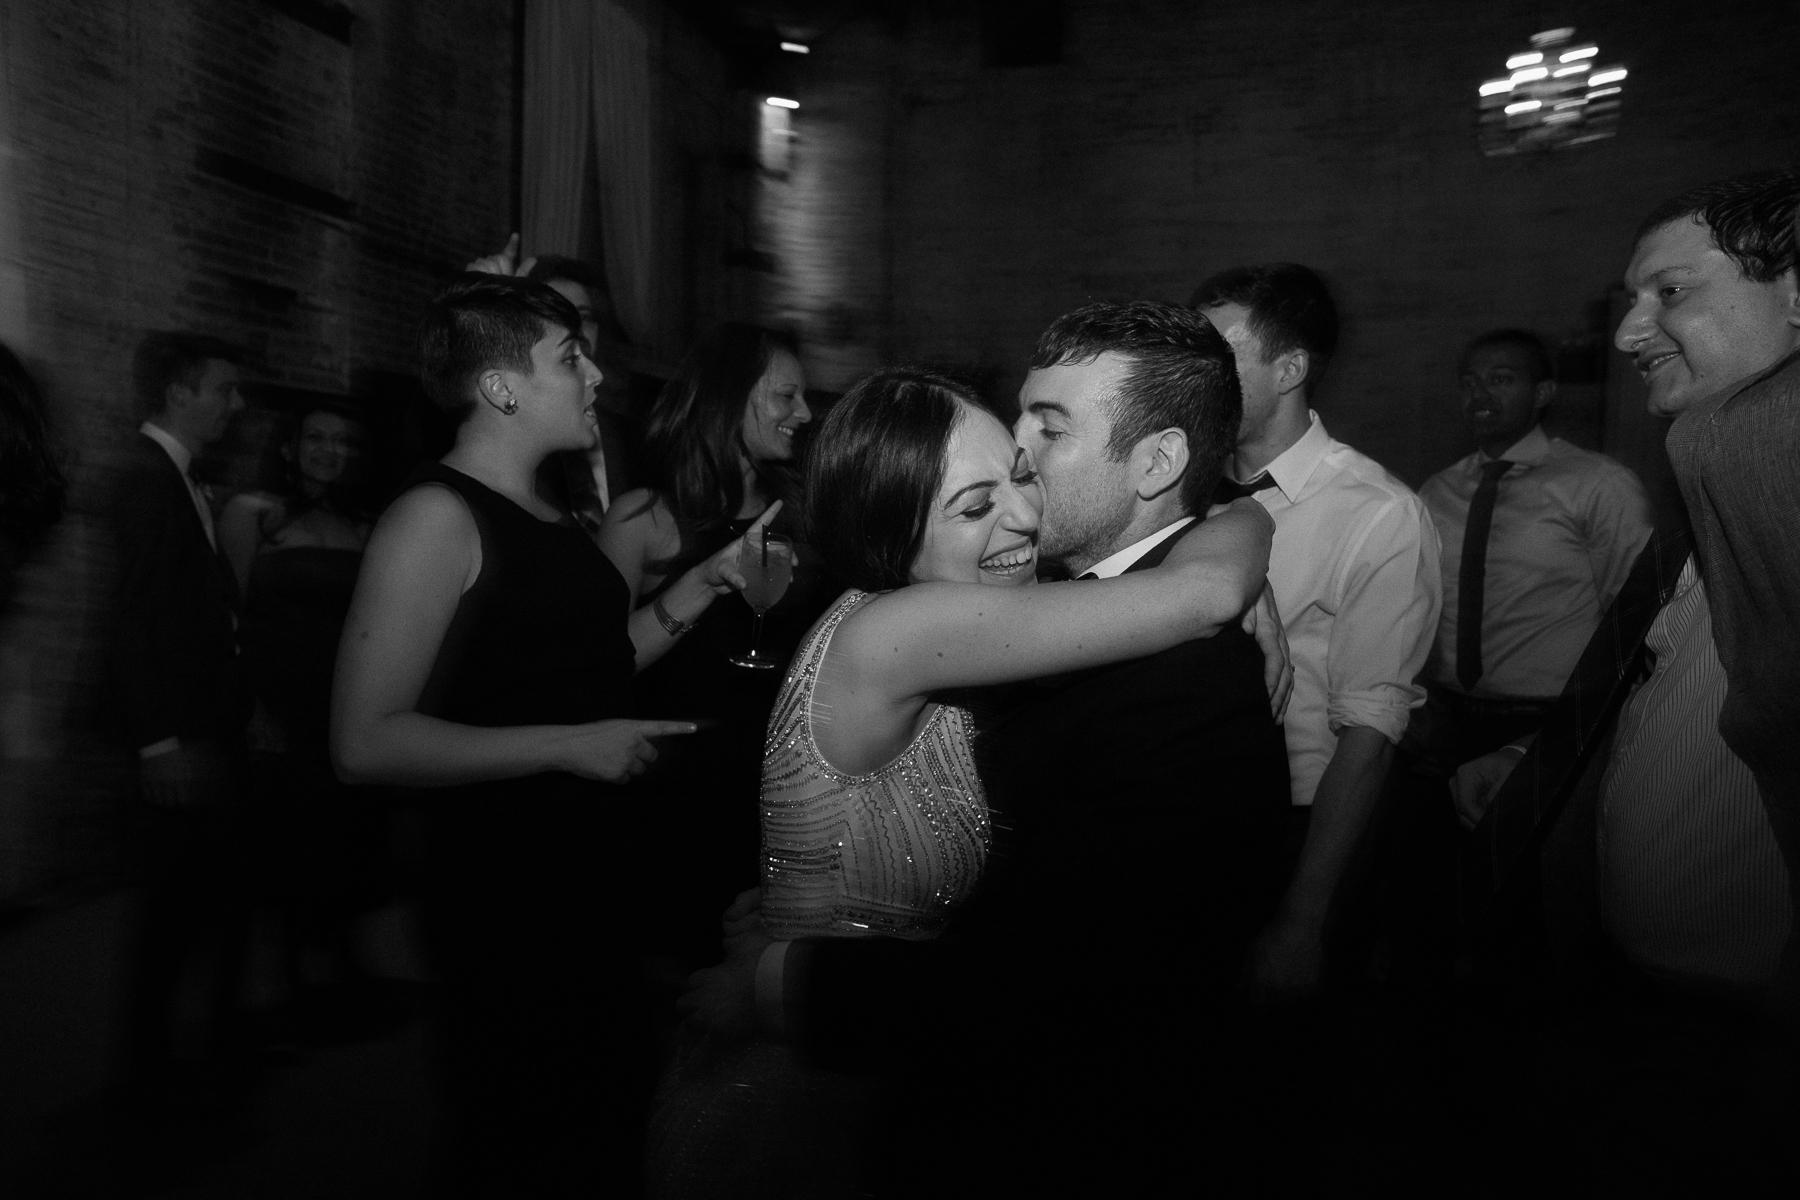 2017_NYC_Wedding_Photographer_Nontraditional_Candid-4.jpg